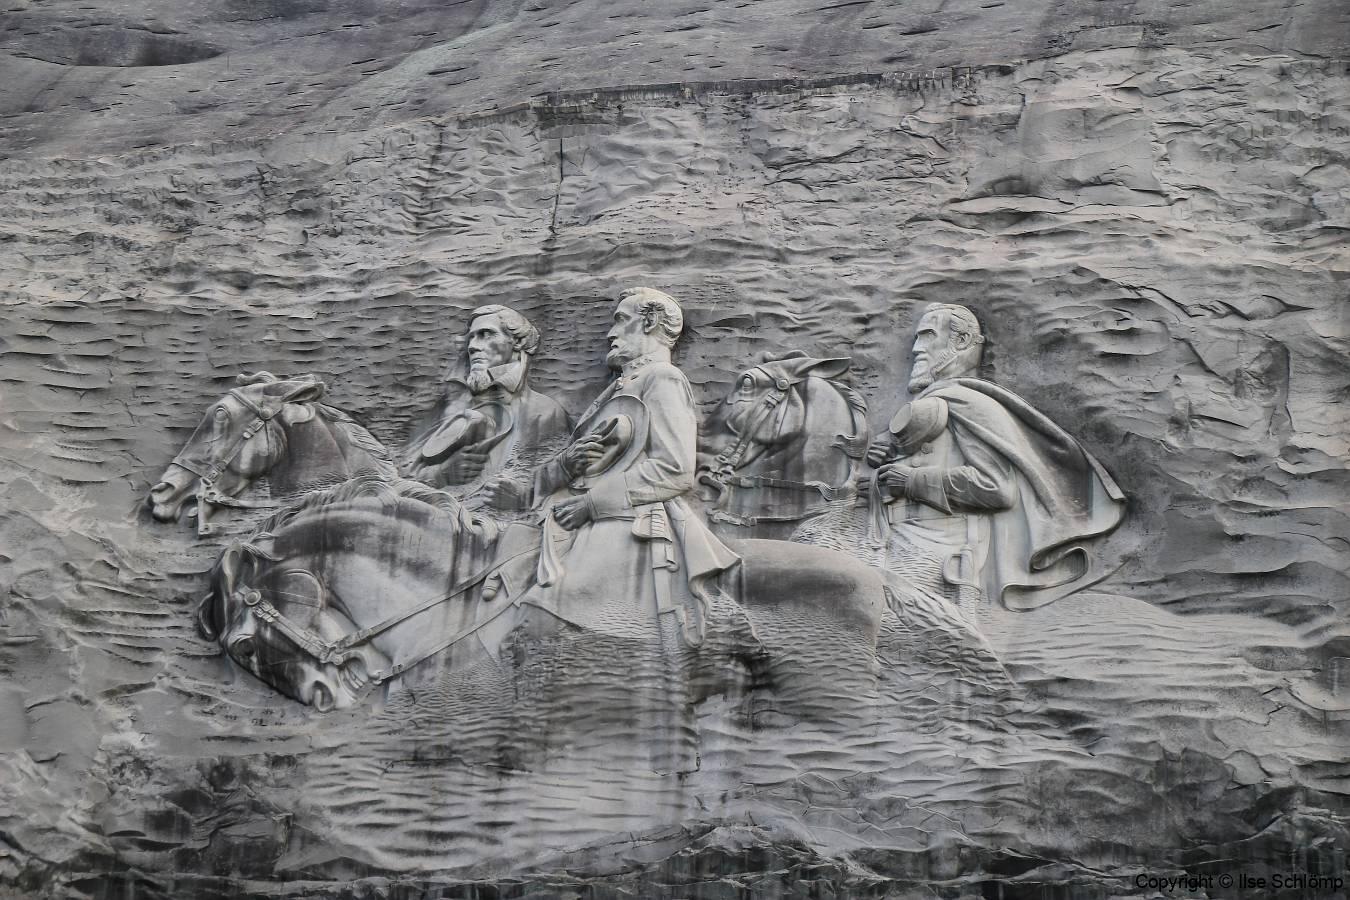 USA, Georgia, Atlanta, Stone Mountain, Das Relief mit Präsident Jefferson Davis und die Generäle Thomas Jackson und Robert E. Lee